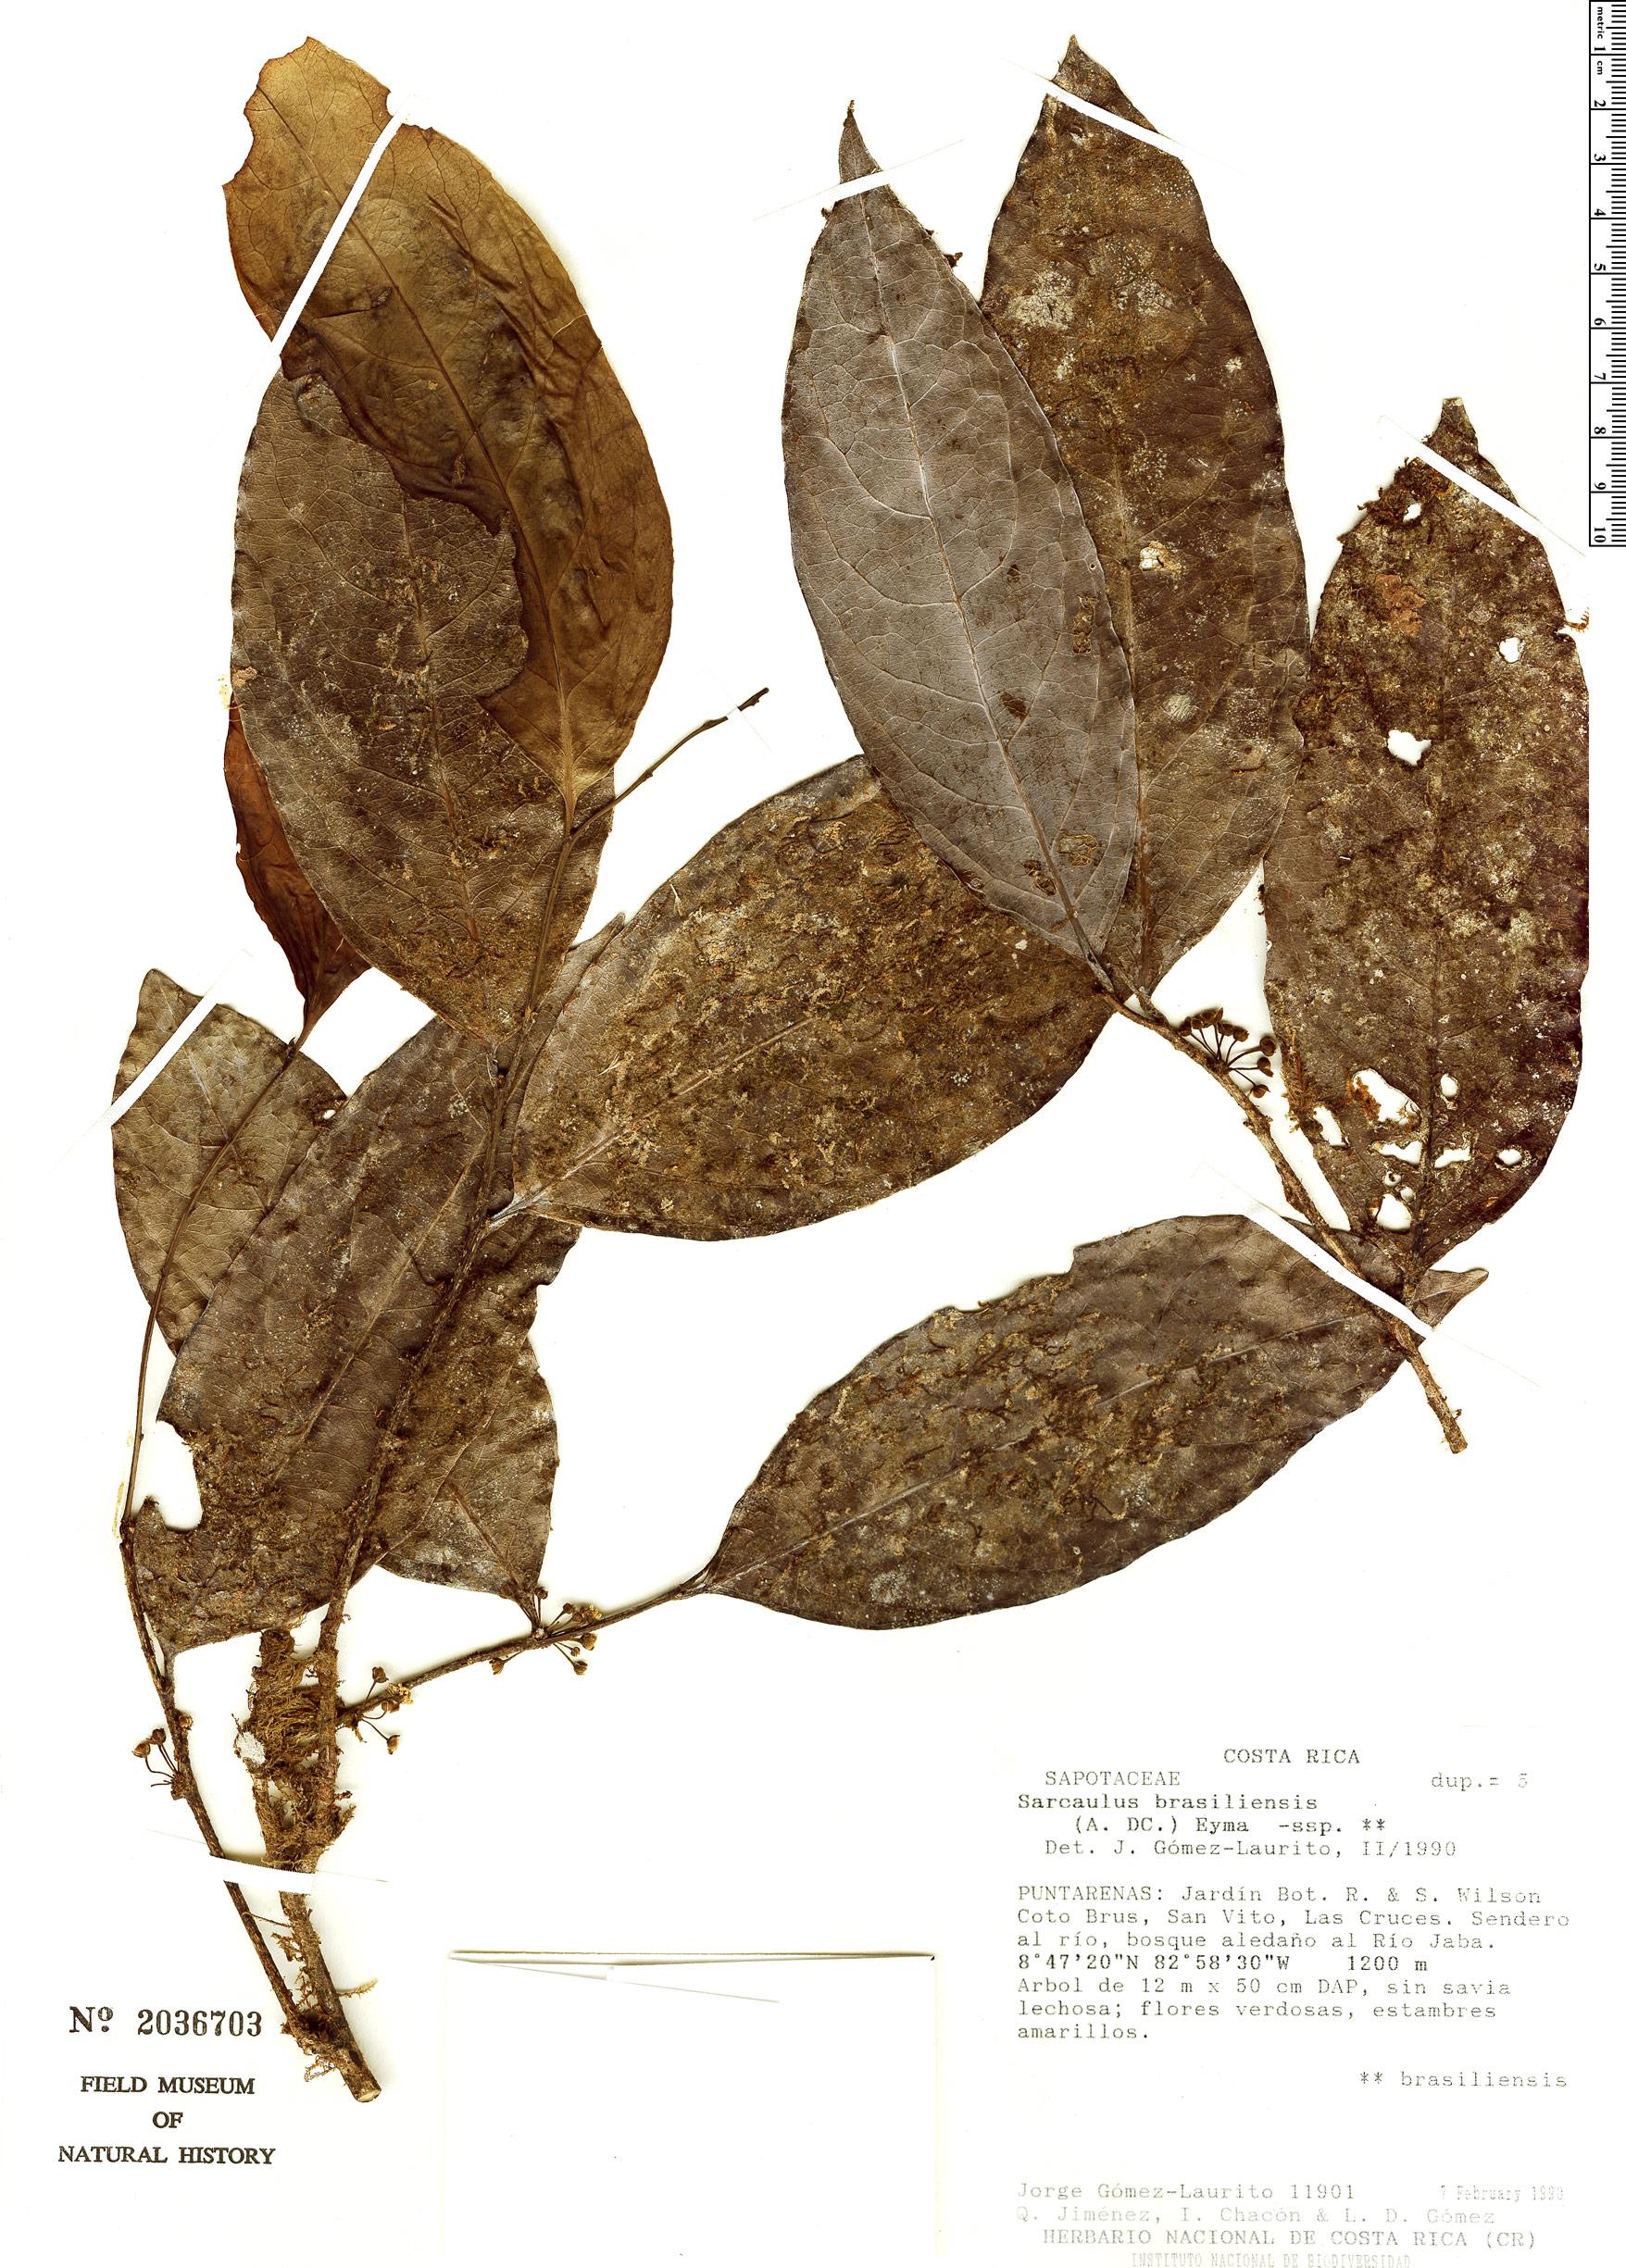 Specimen: Sarcaulus brasiliensis